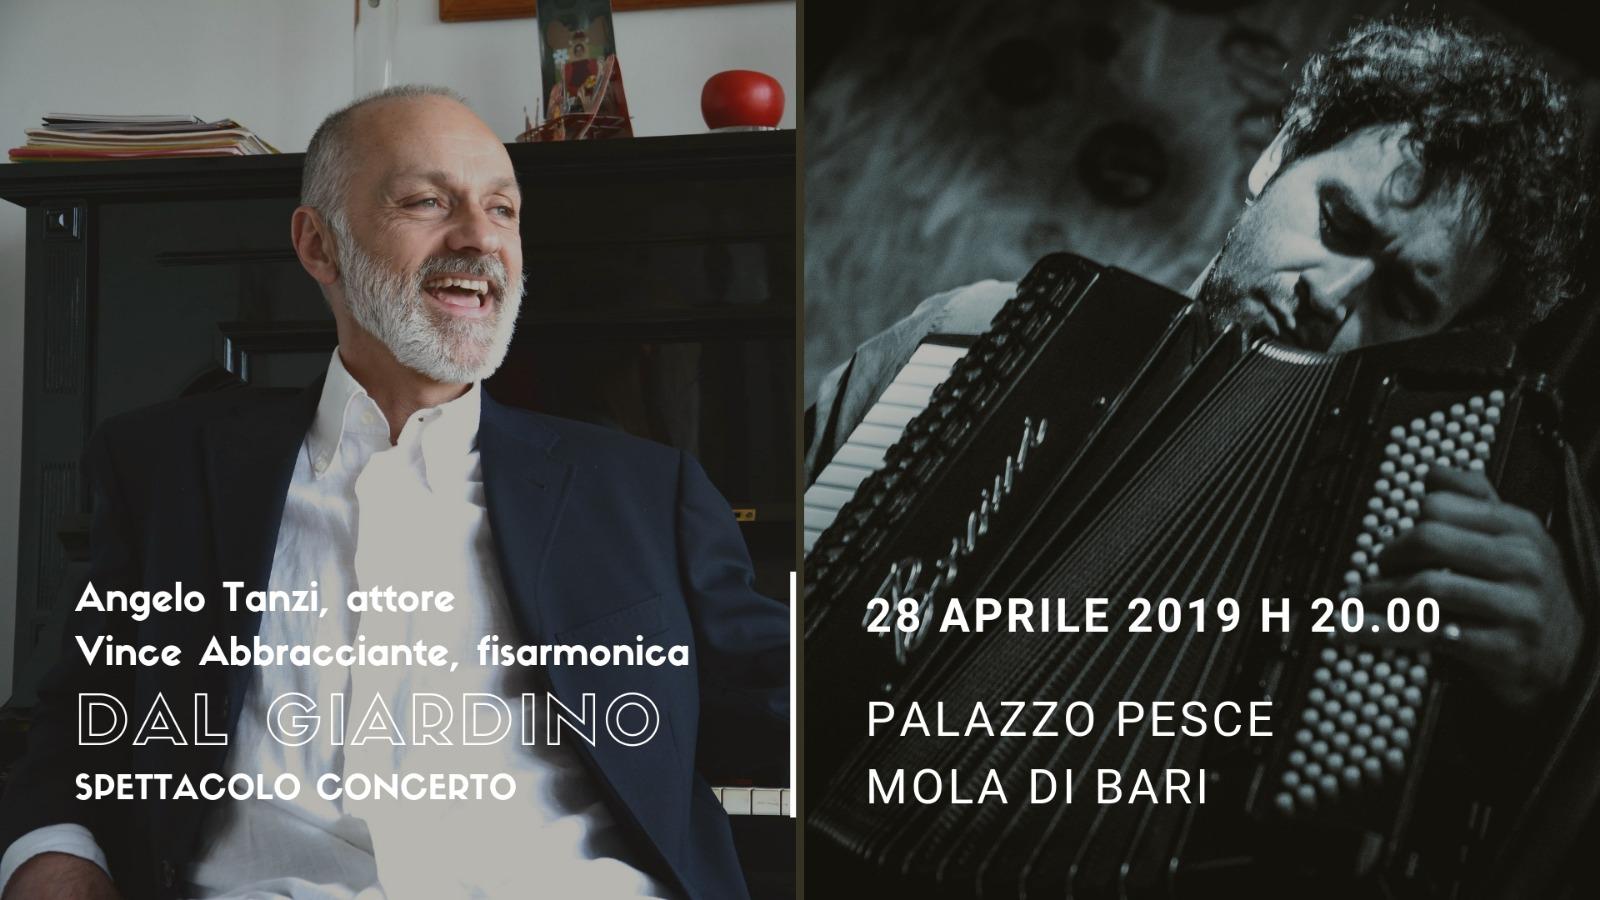 28 aprile 2019 Dal giardino Angelo Tanzi a Palazzo Pesce